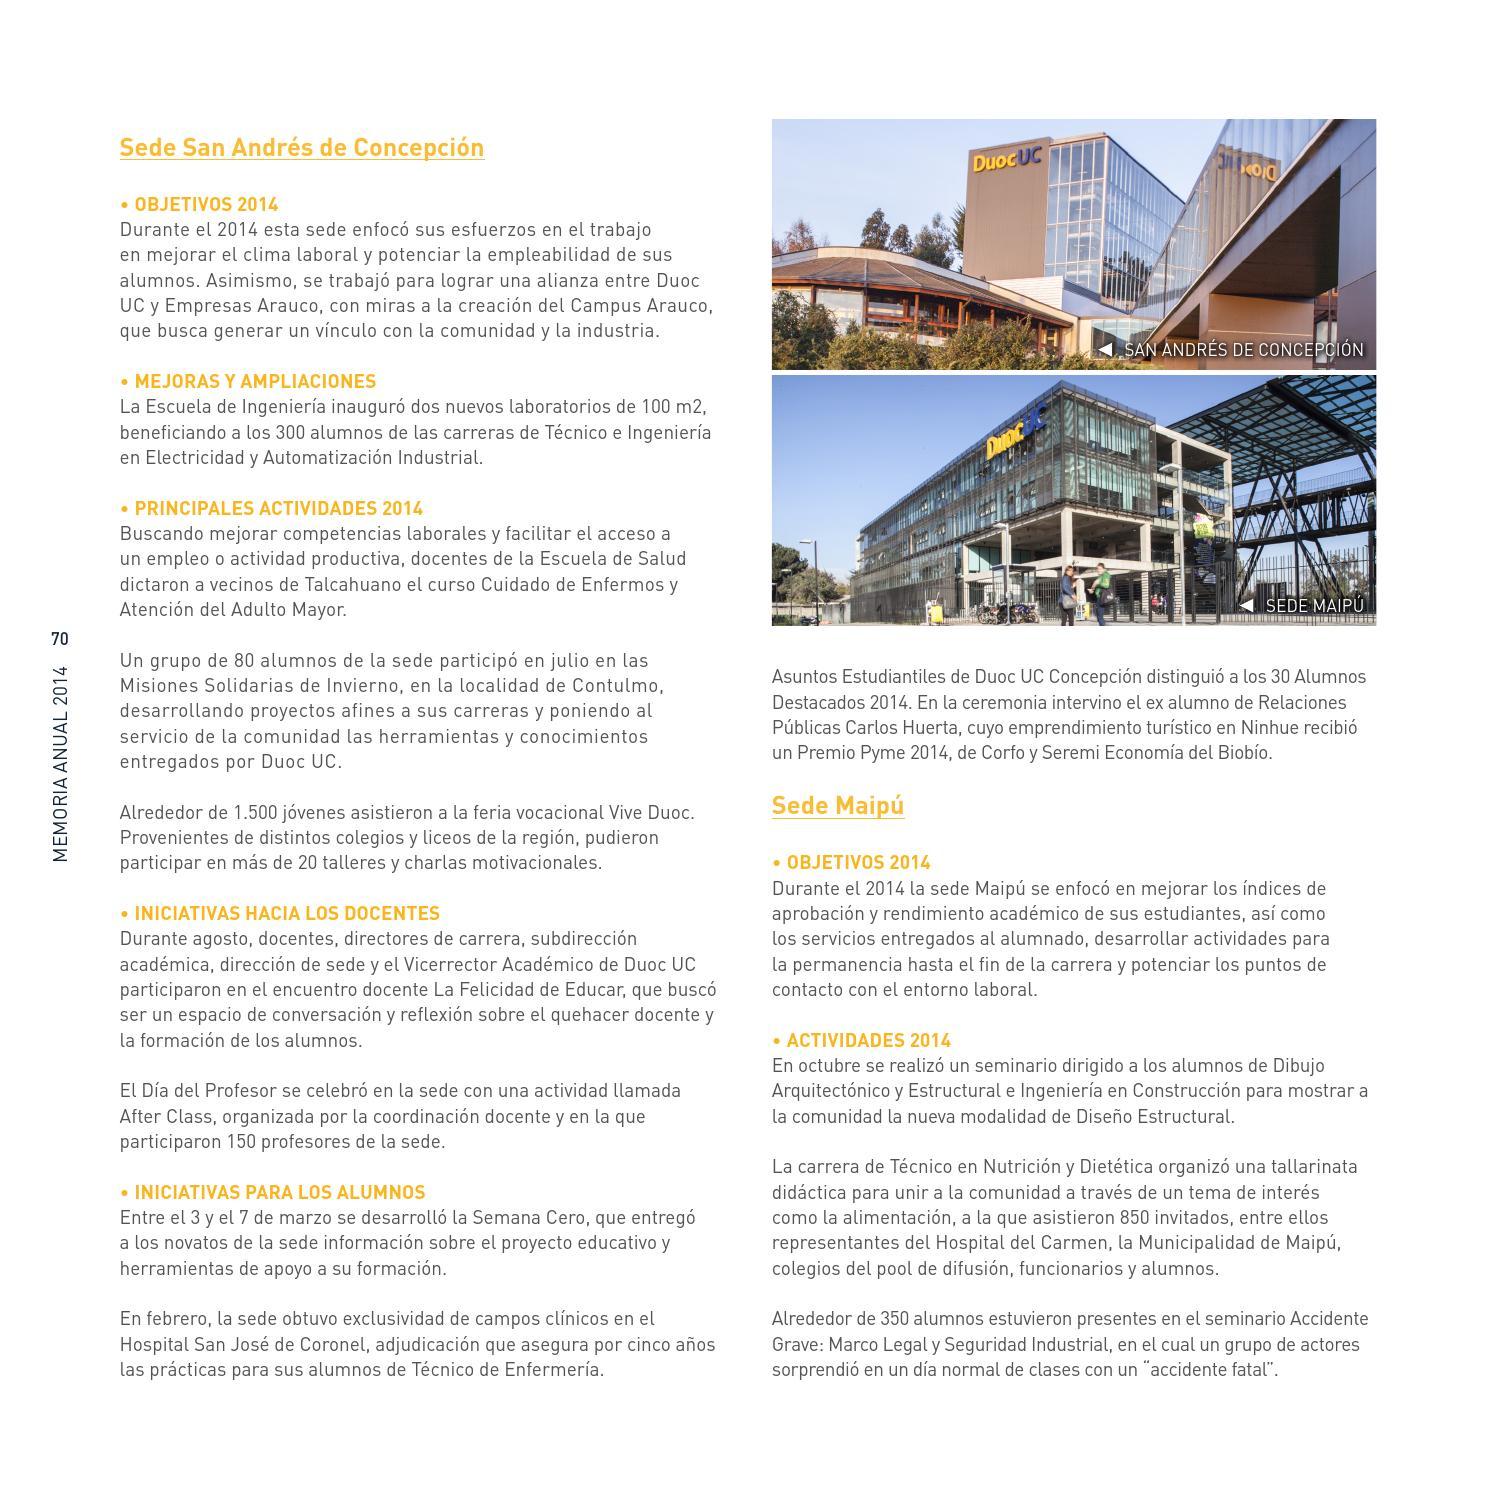 Memoria Anual 2014 - Duoc UC by Duoc UC - issuu